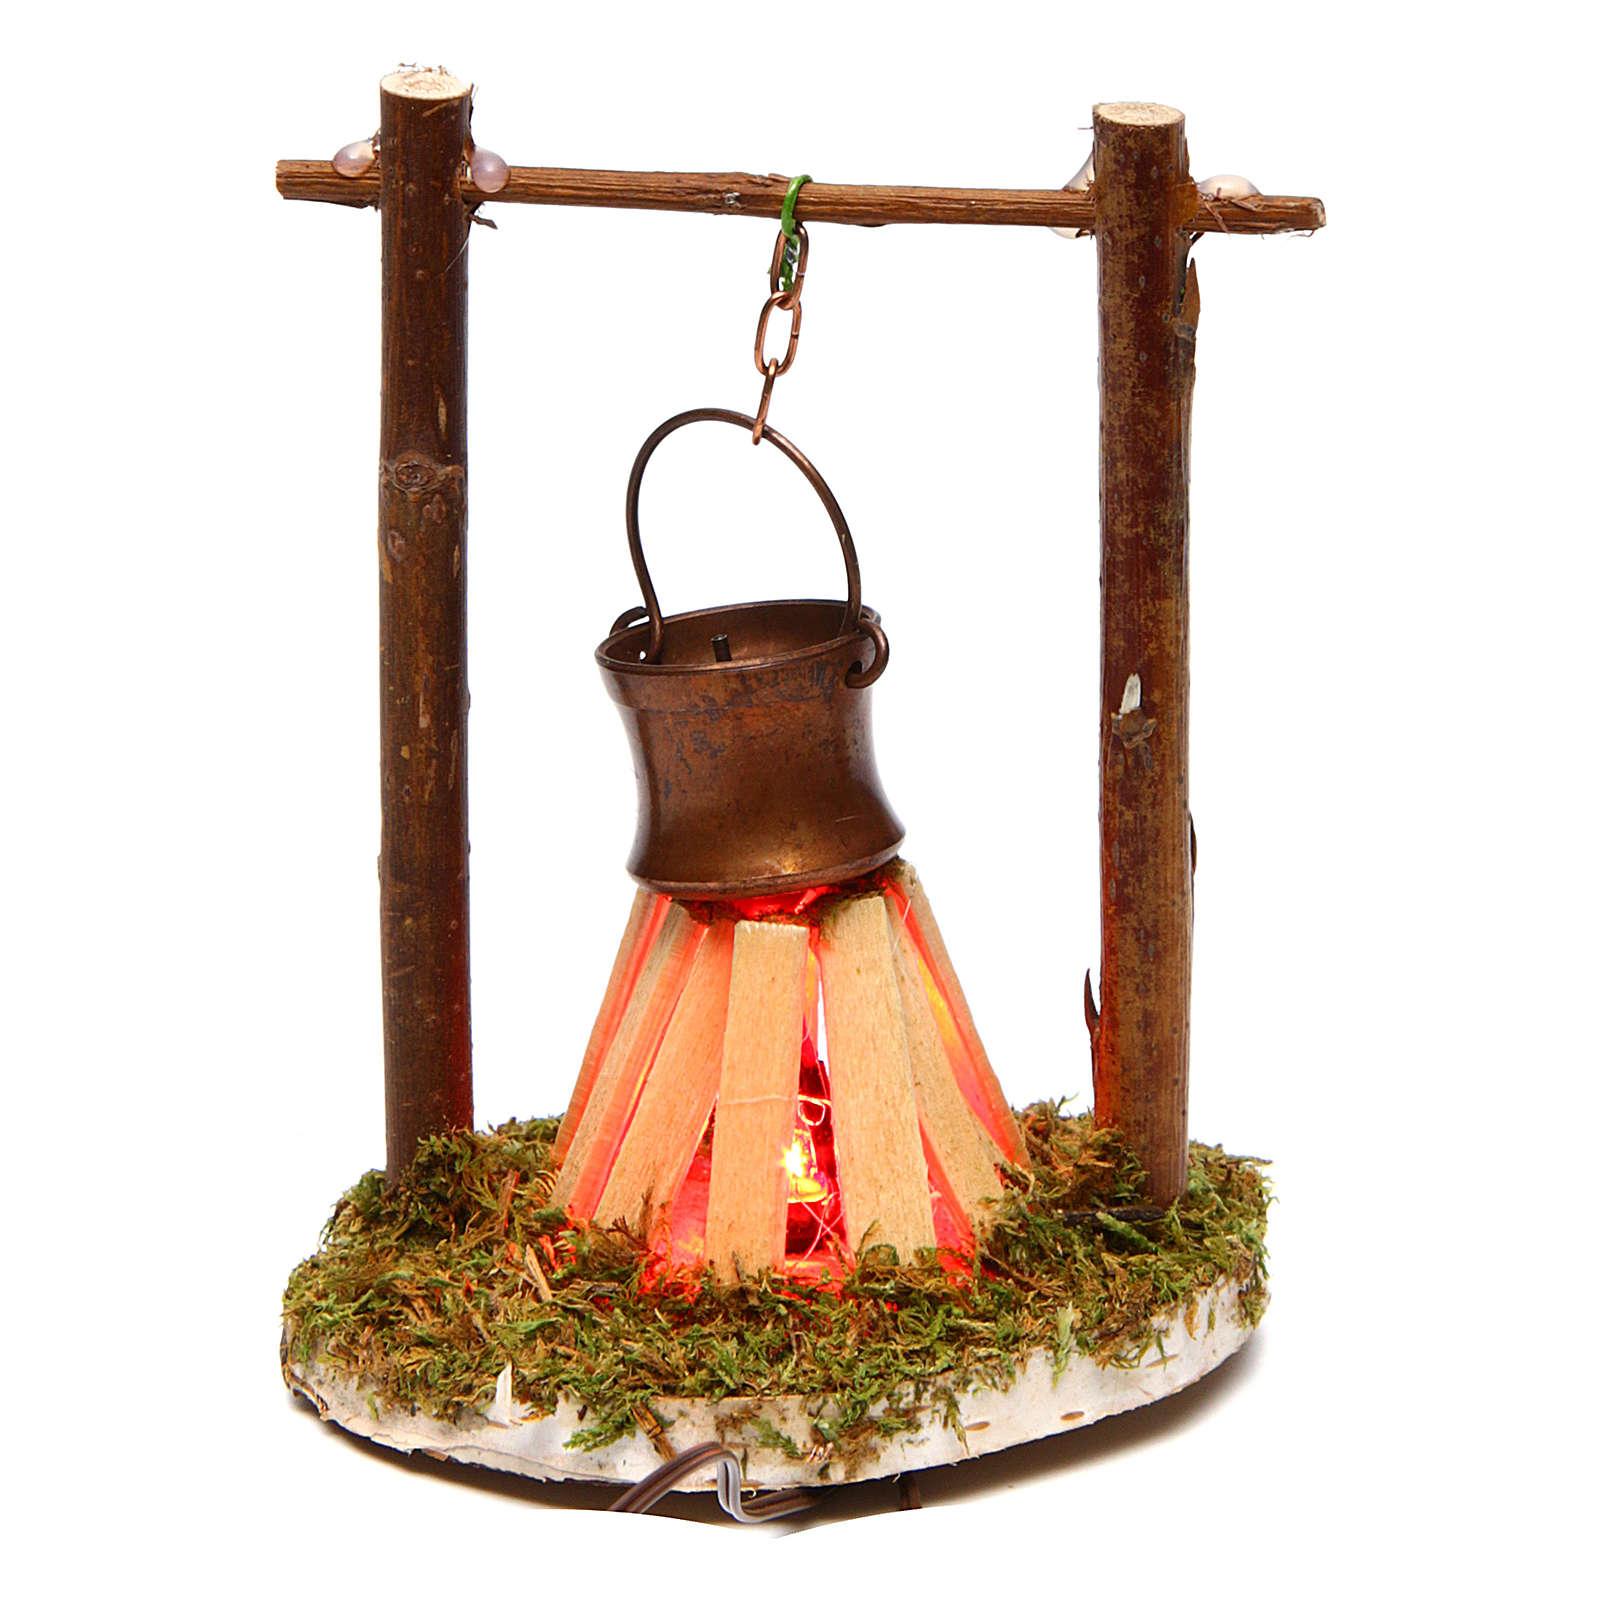 Camp fire cauldron with smoke and light 4,5V h. 9x6cm 4